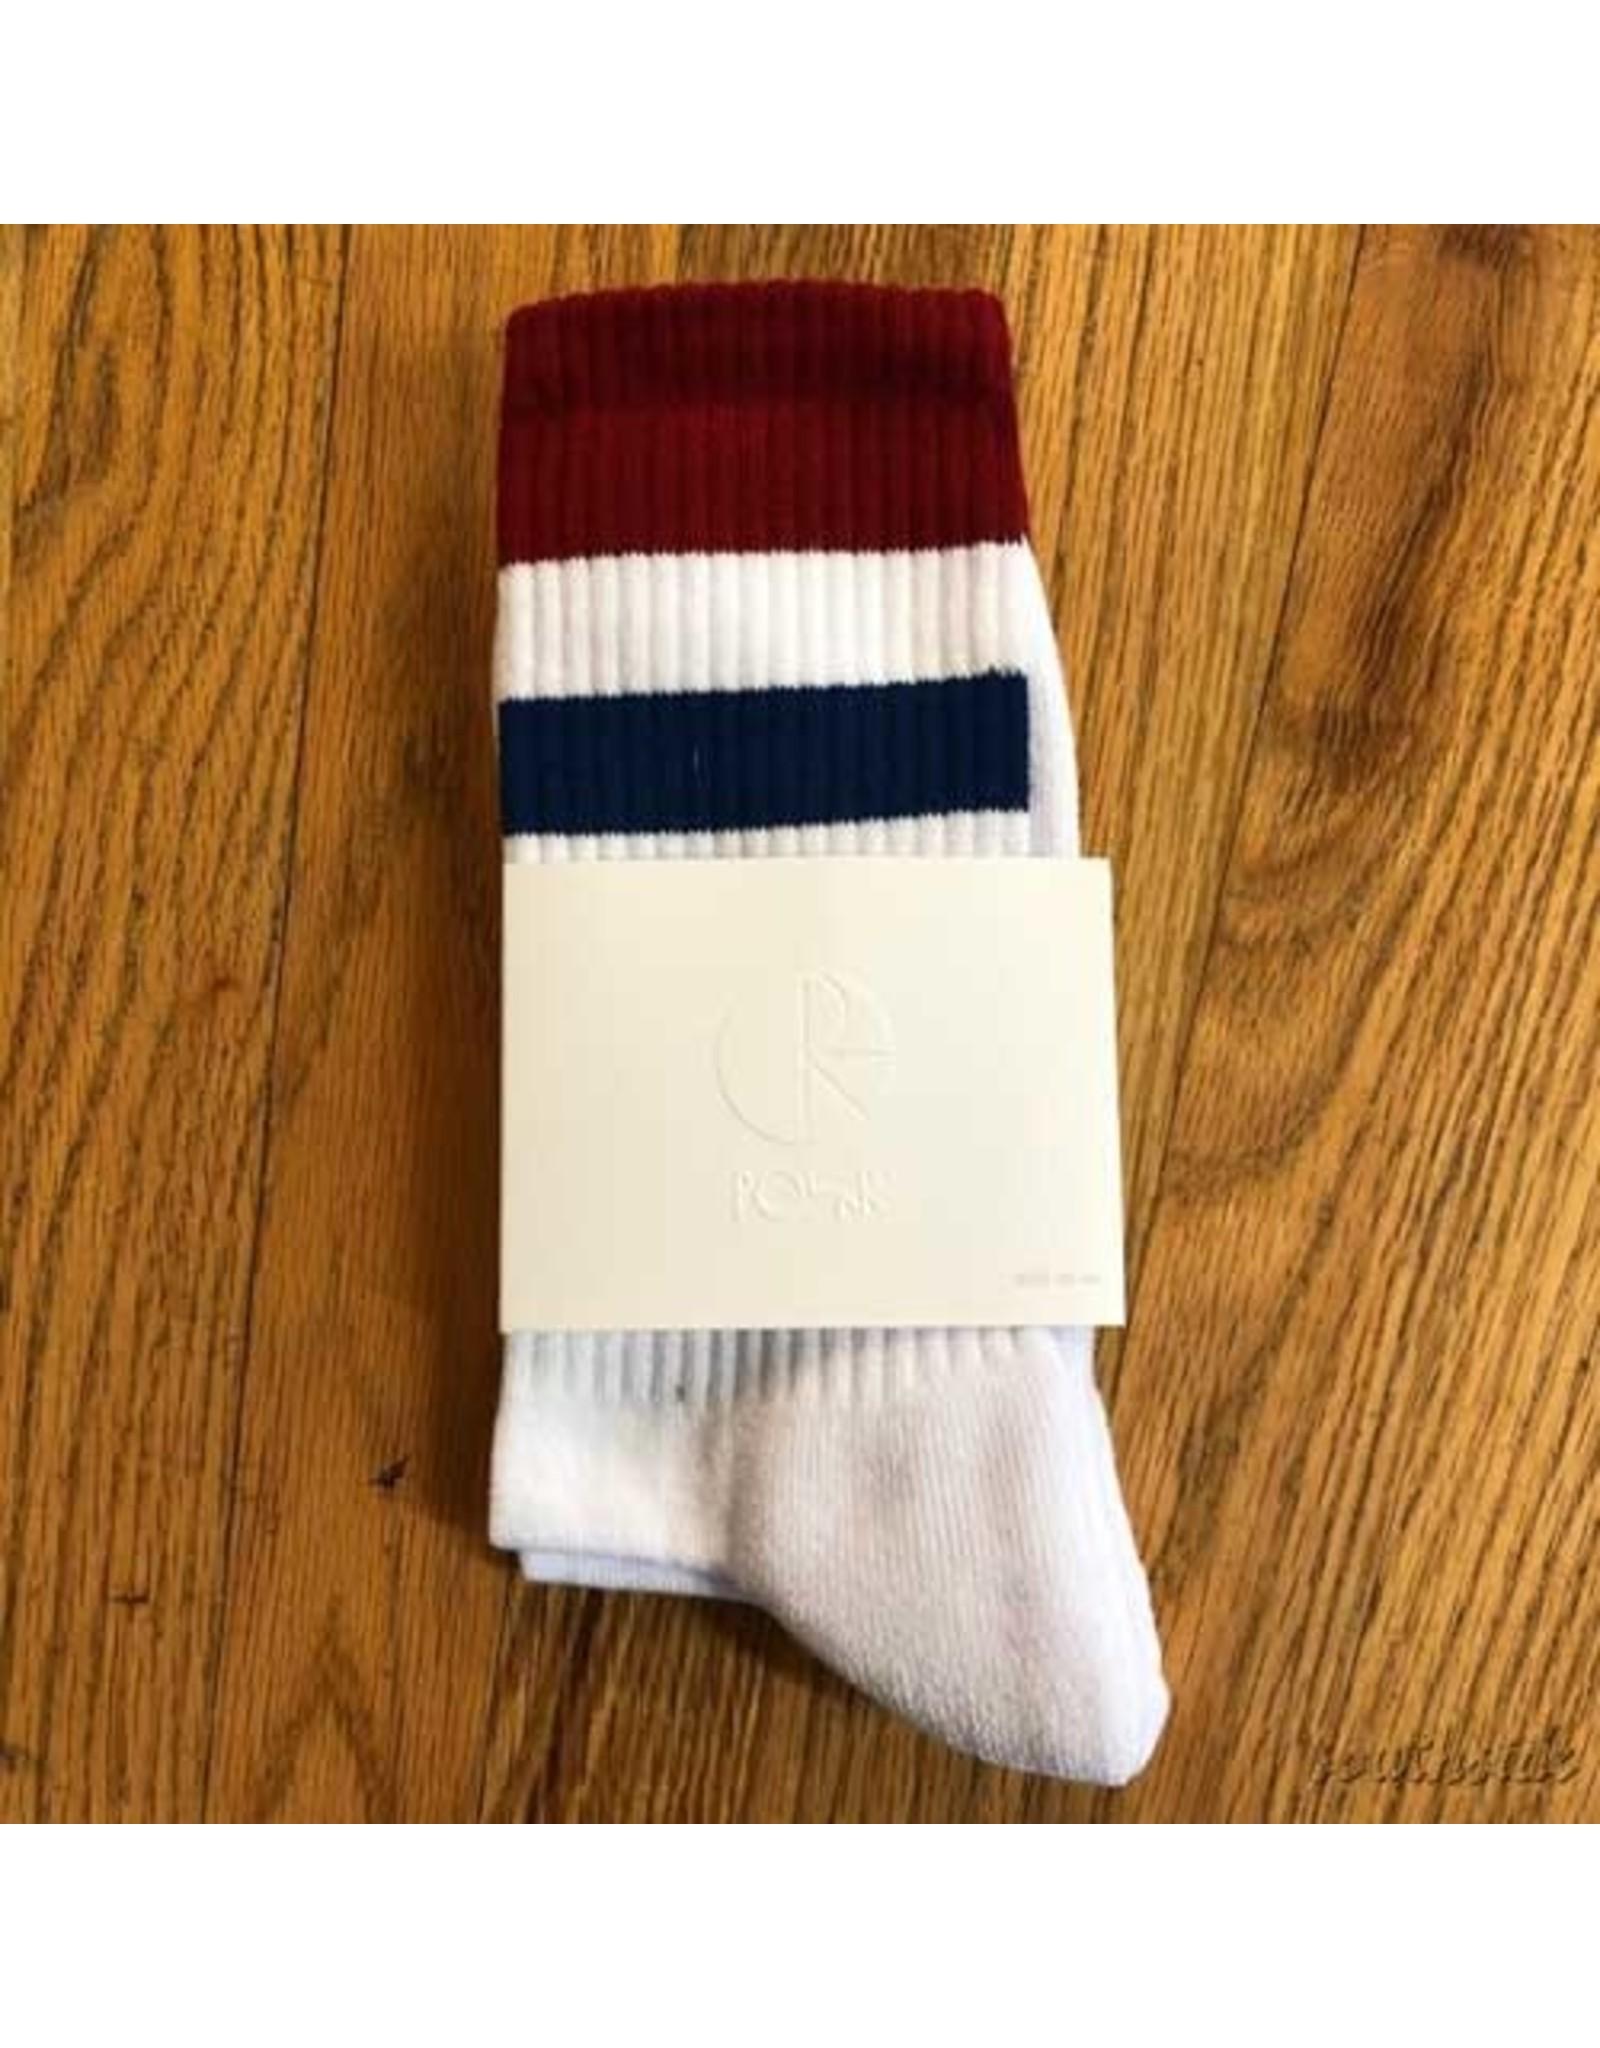 Polar Socks White Burg Navy Stripe Size 9-11